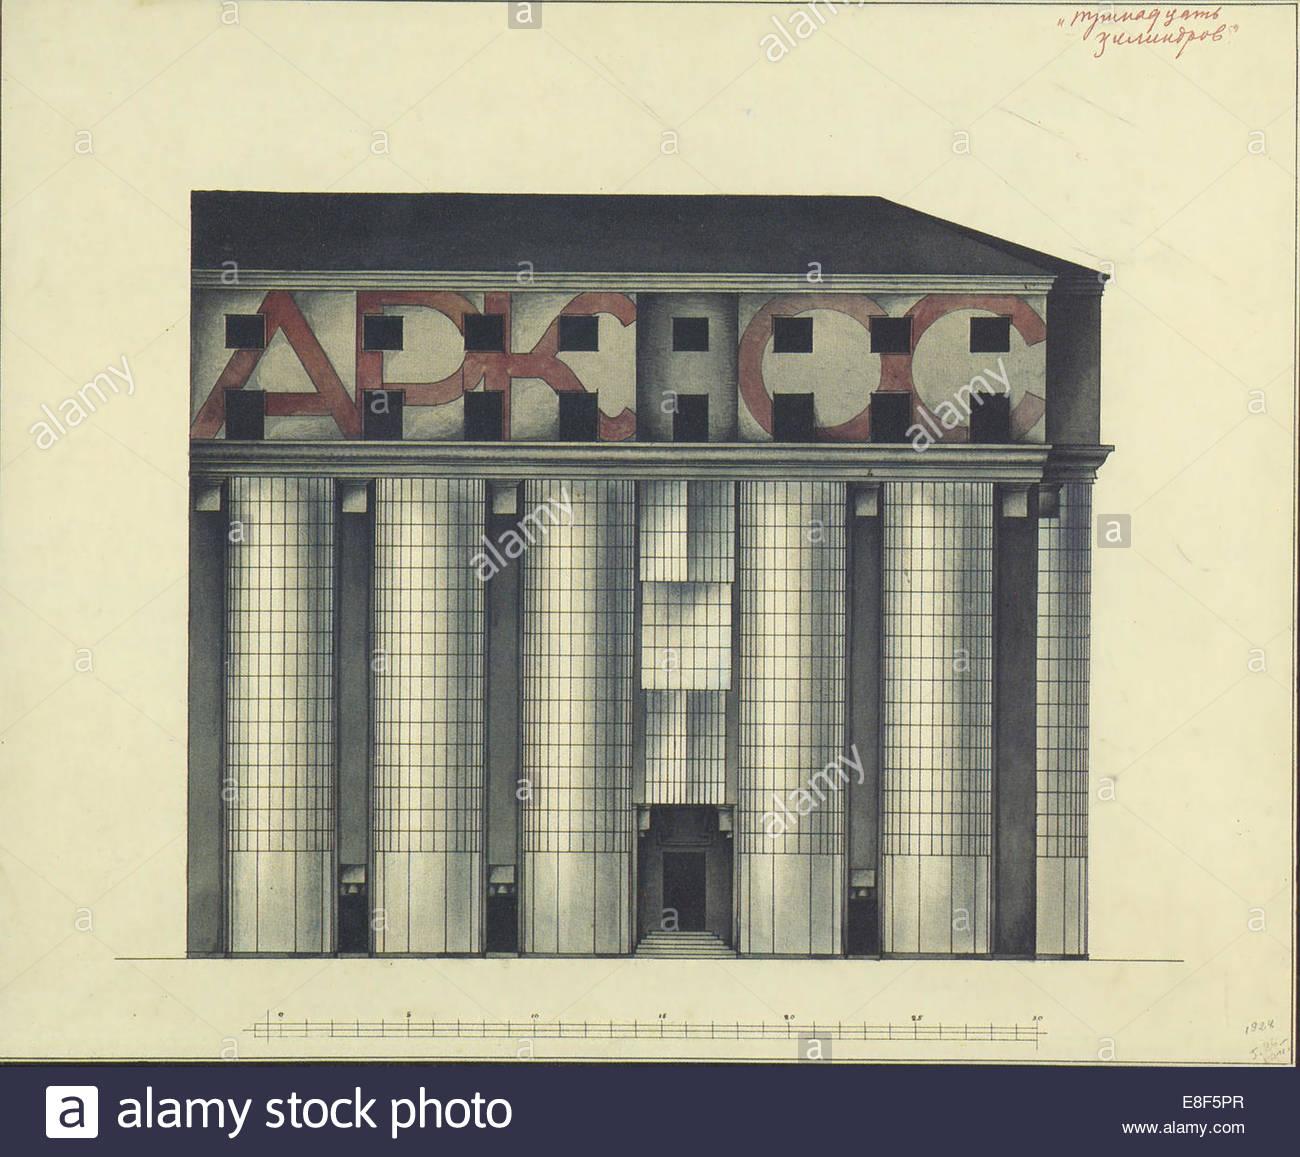 Project for the Arkos building facade. Artist: Vesnin, Viktor Alexandrorovich (1882-1950) - Stock Image